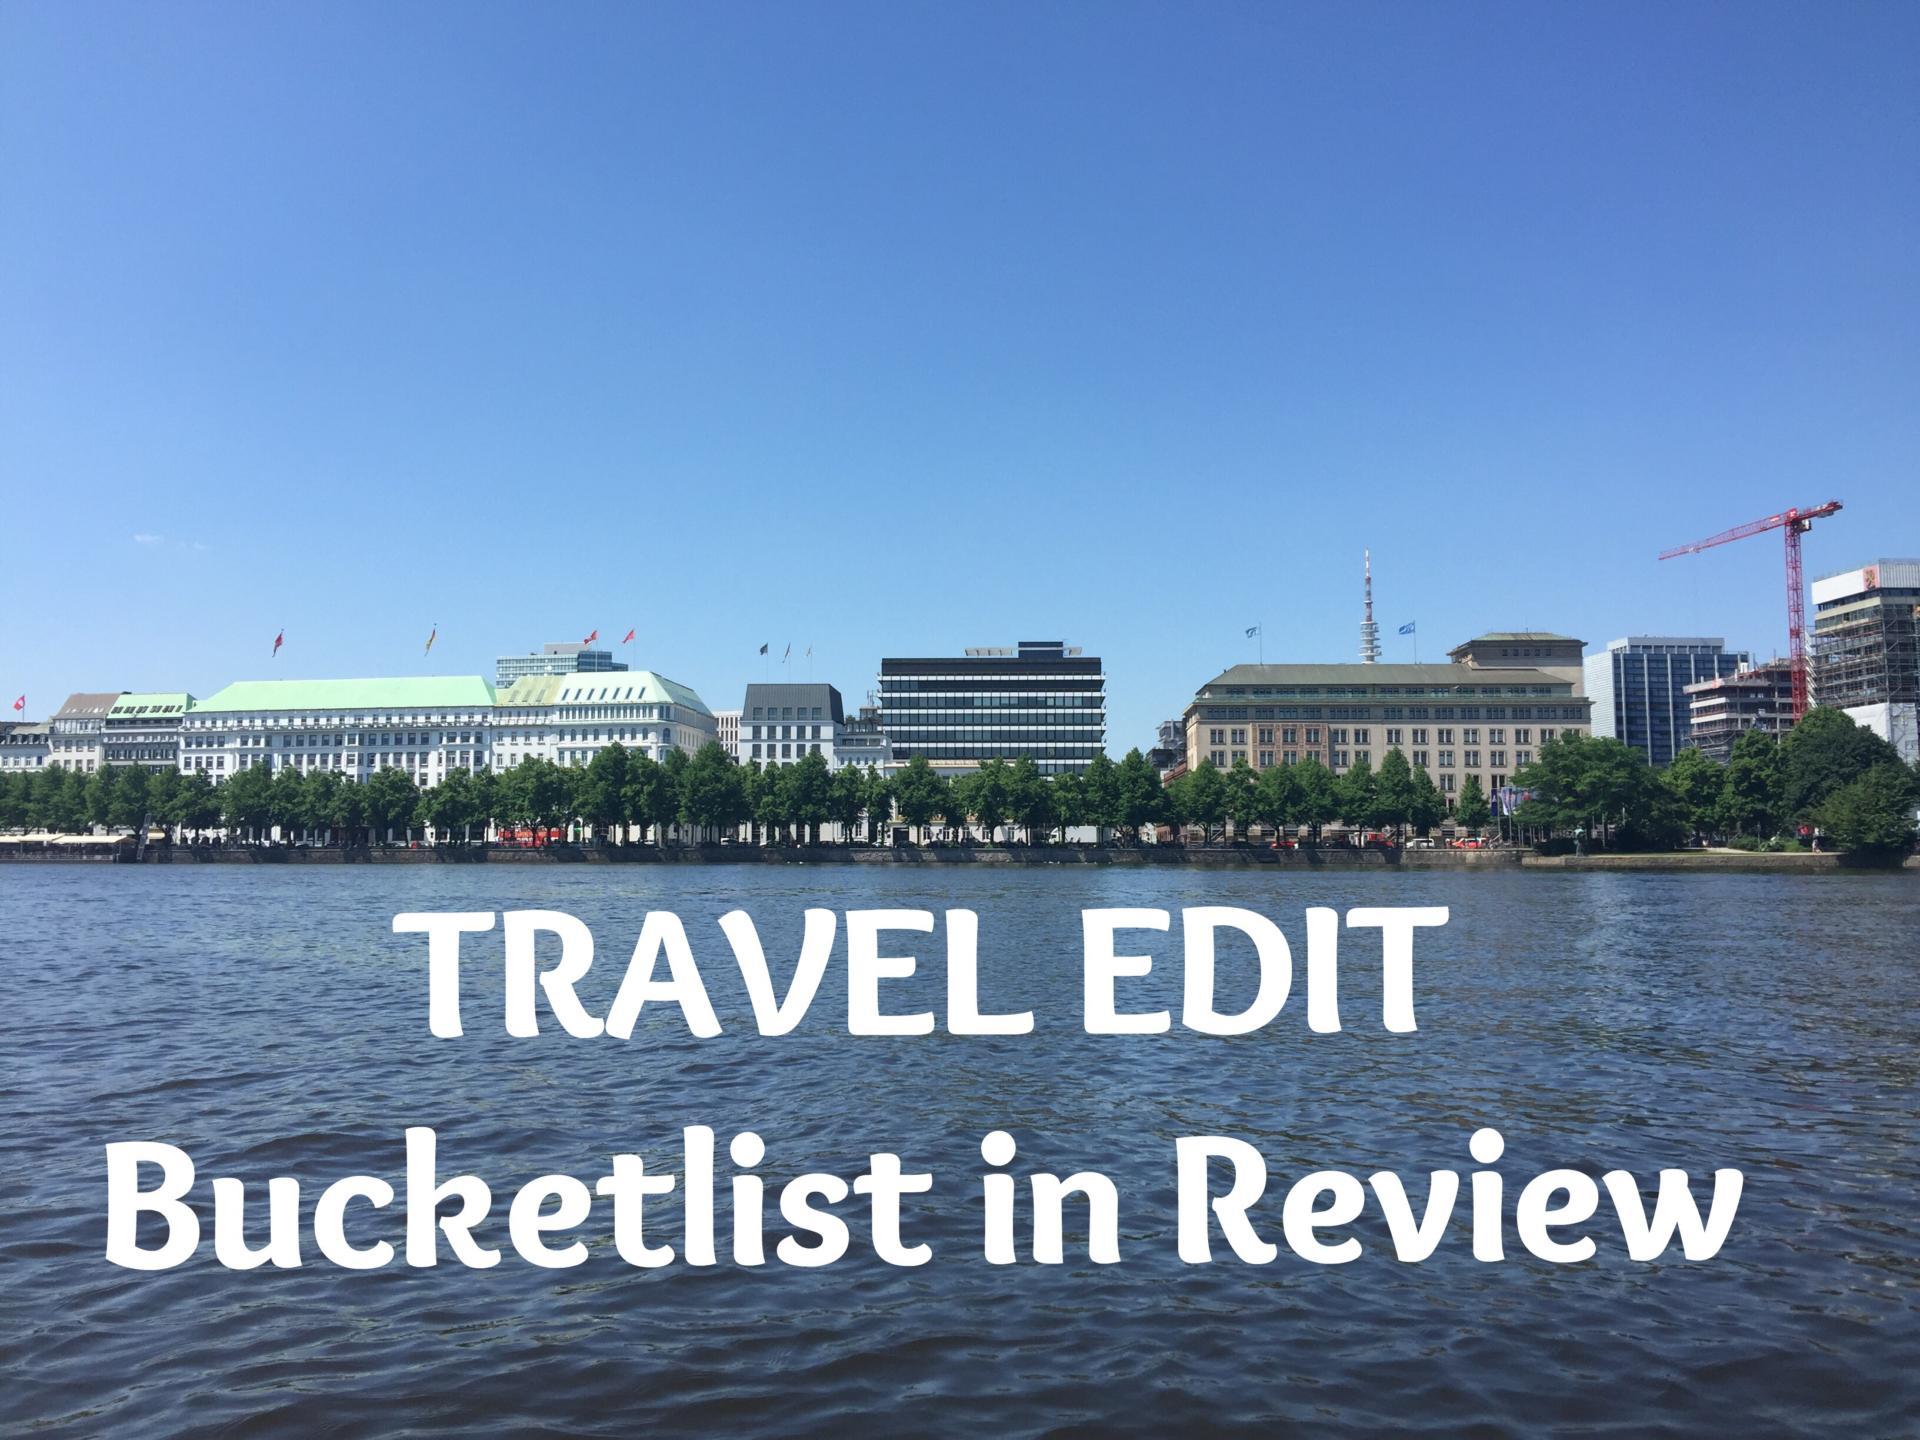 Travel Edit